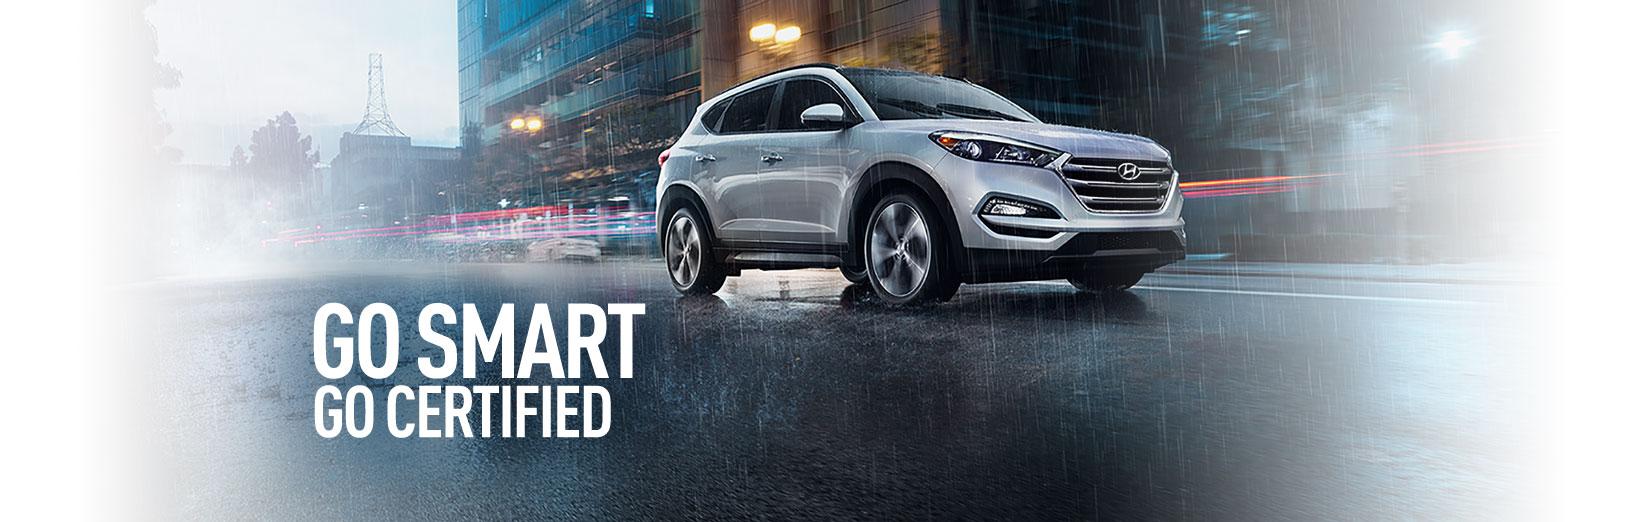 New Hyundai Exterior Image 1